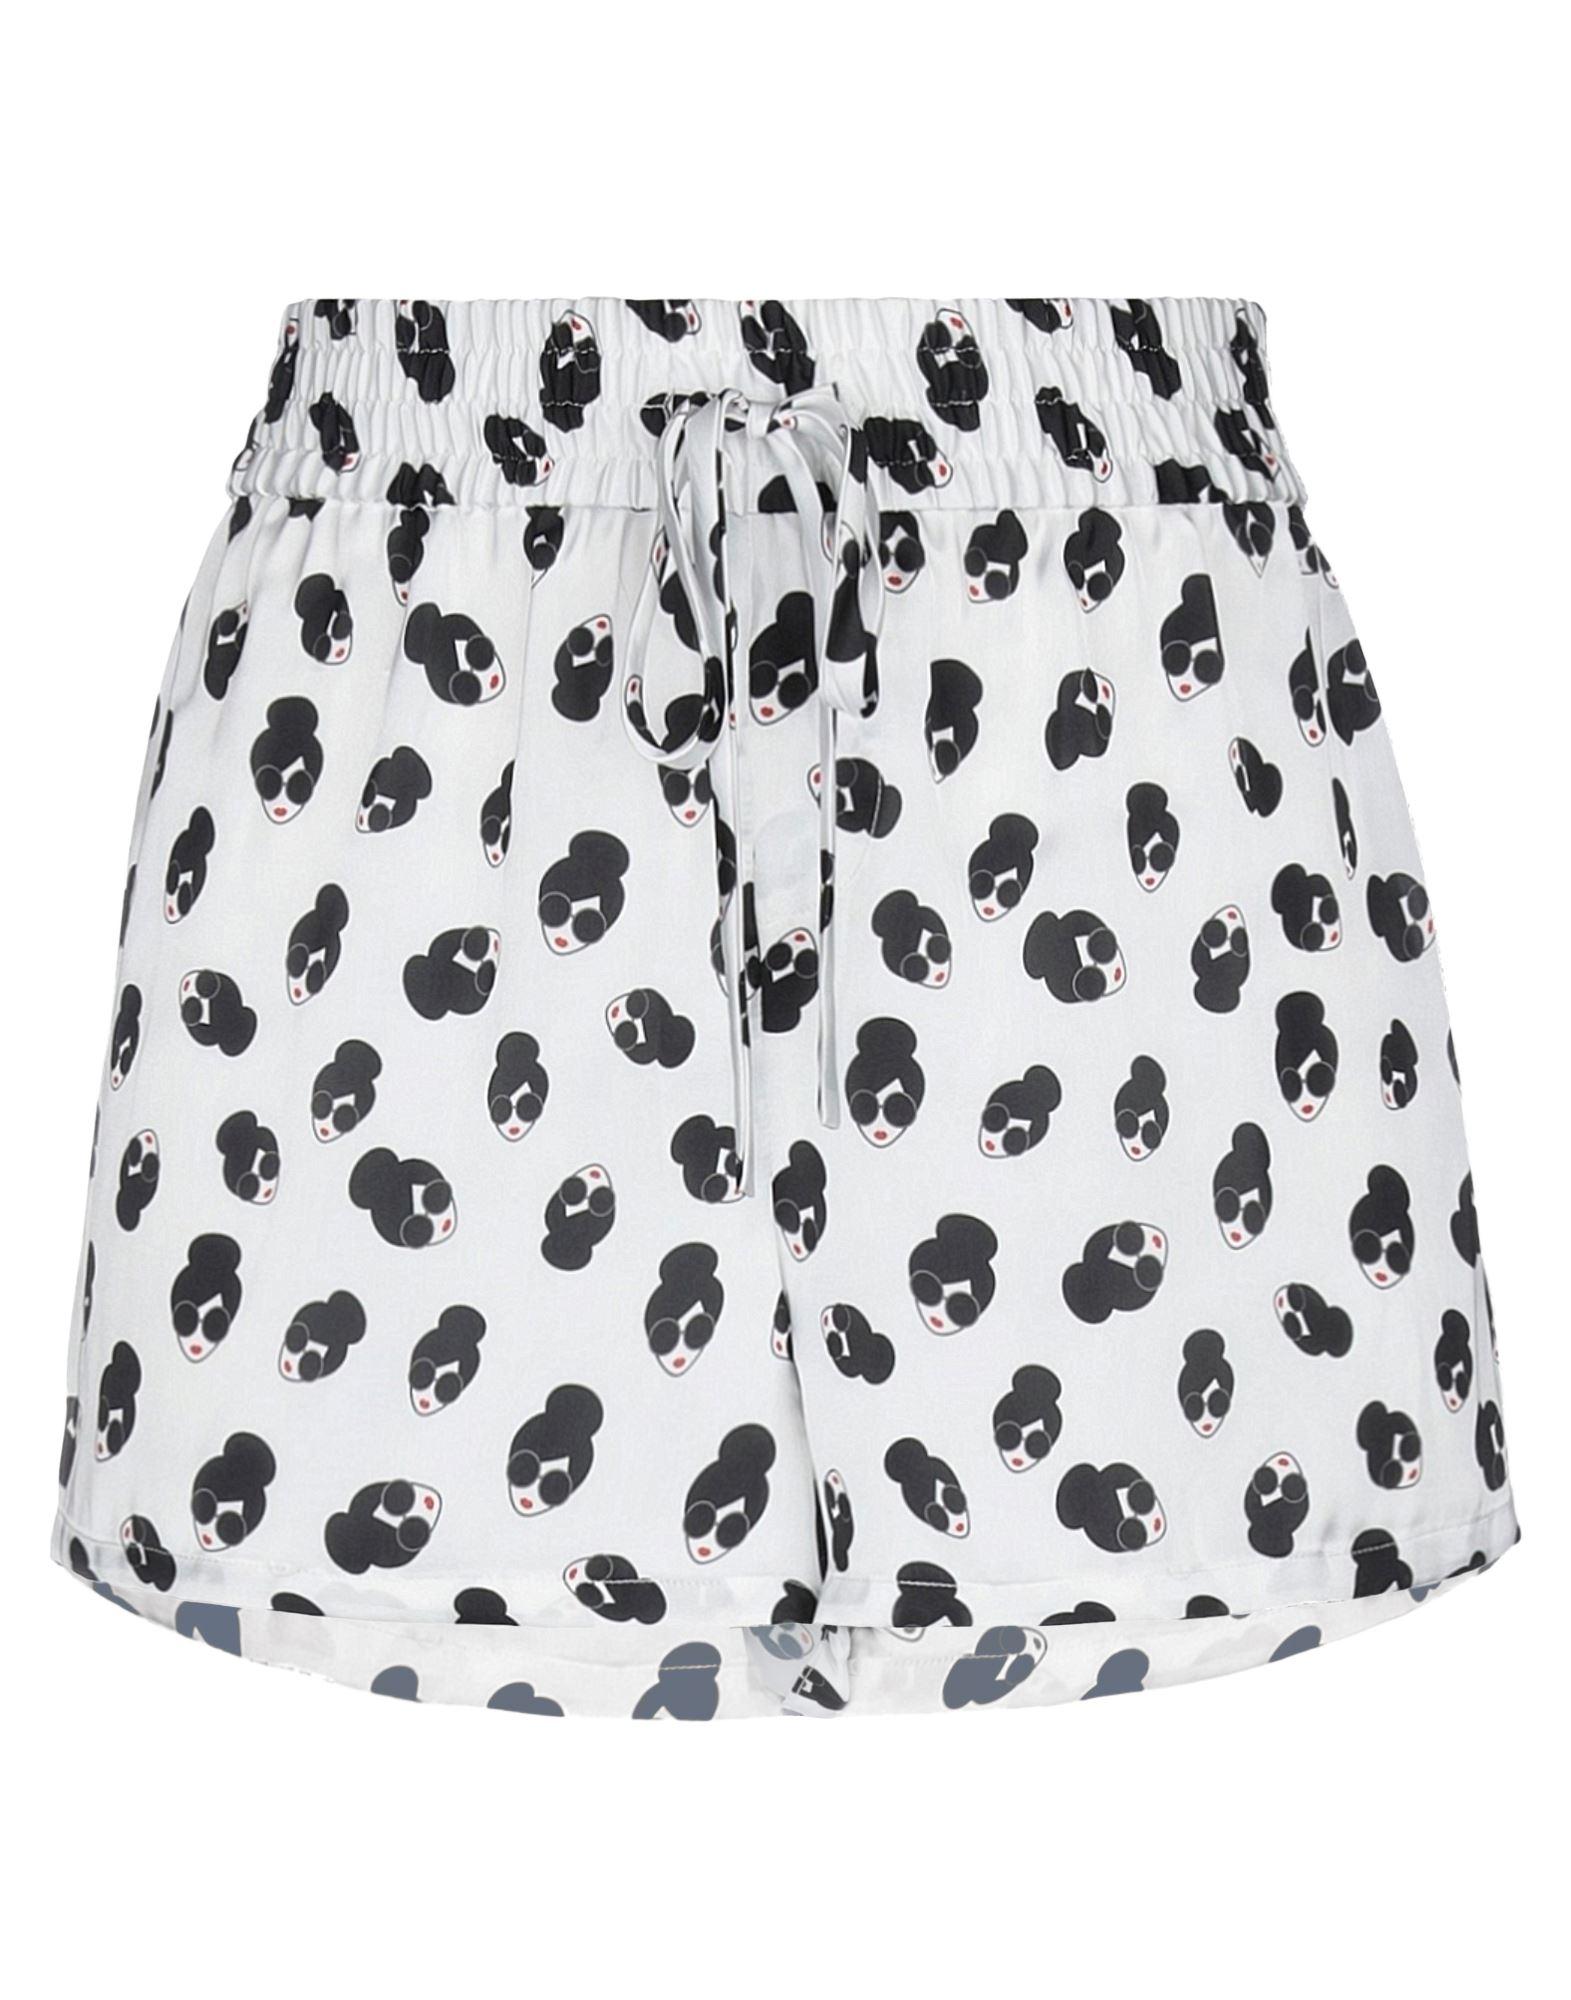 ALICE + OLIVIA Shorts. satin, multicolor pattern, no appliqués, low waisted, drawstring closure, no pockets. 100% Polyester